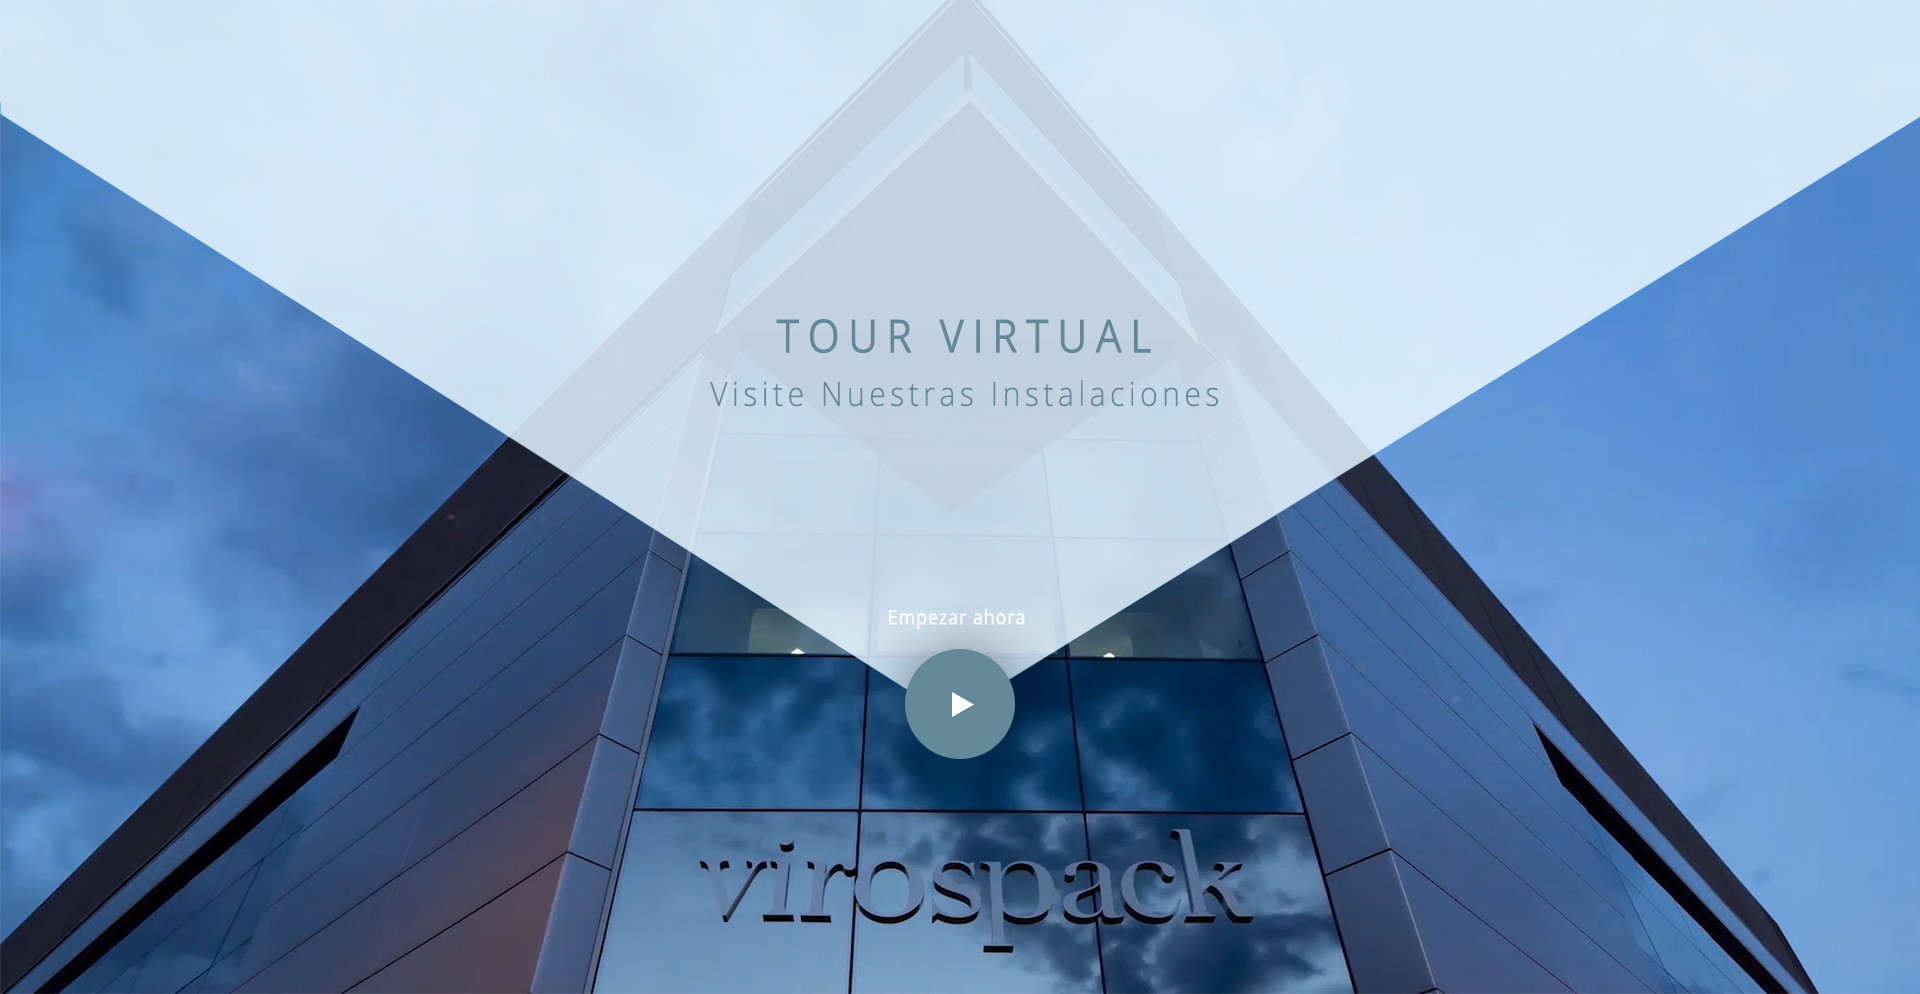 Virospack virtual tour video